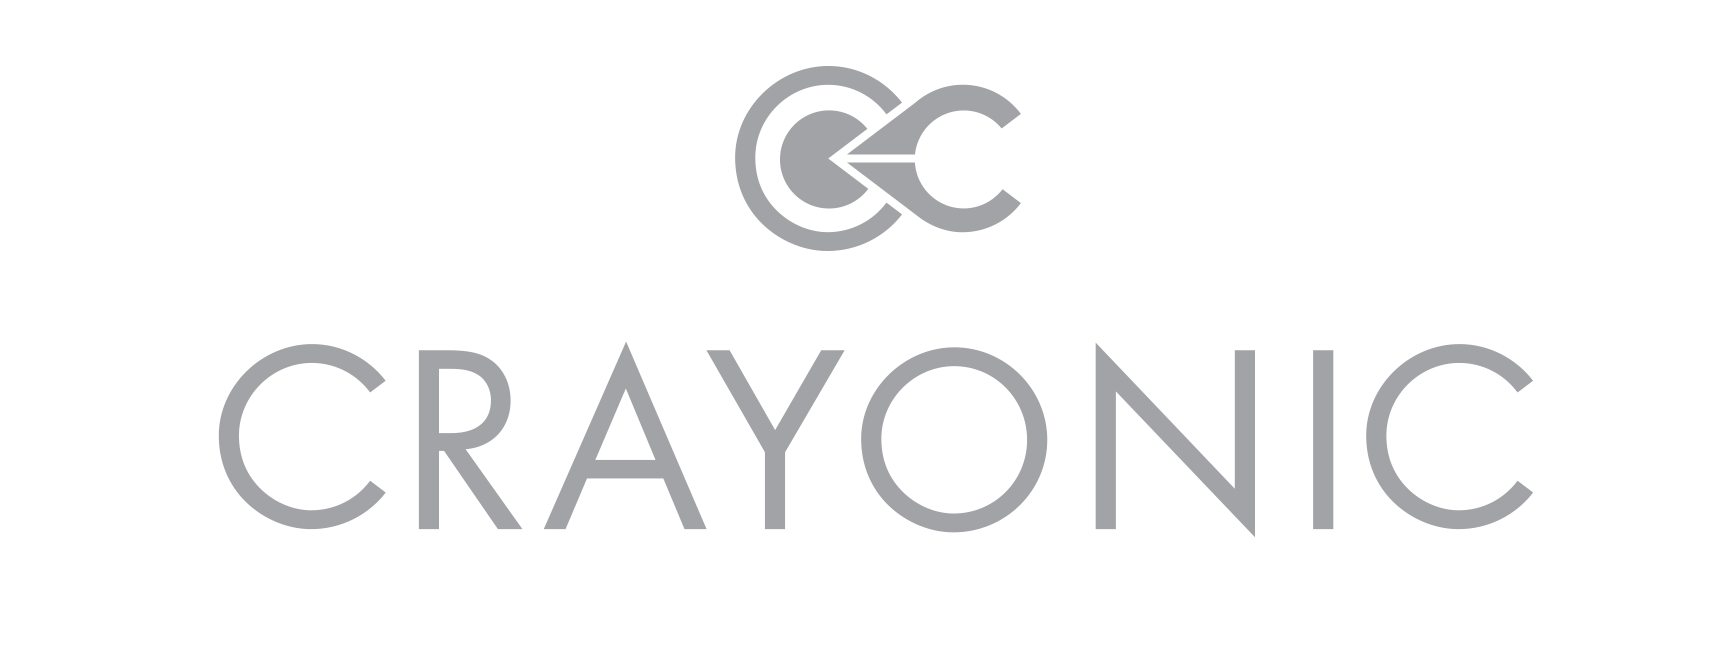 Crayonic logo